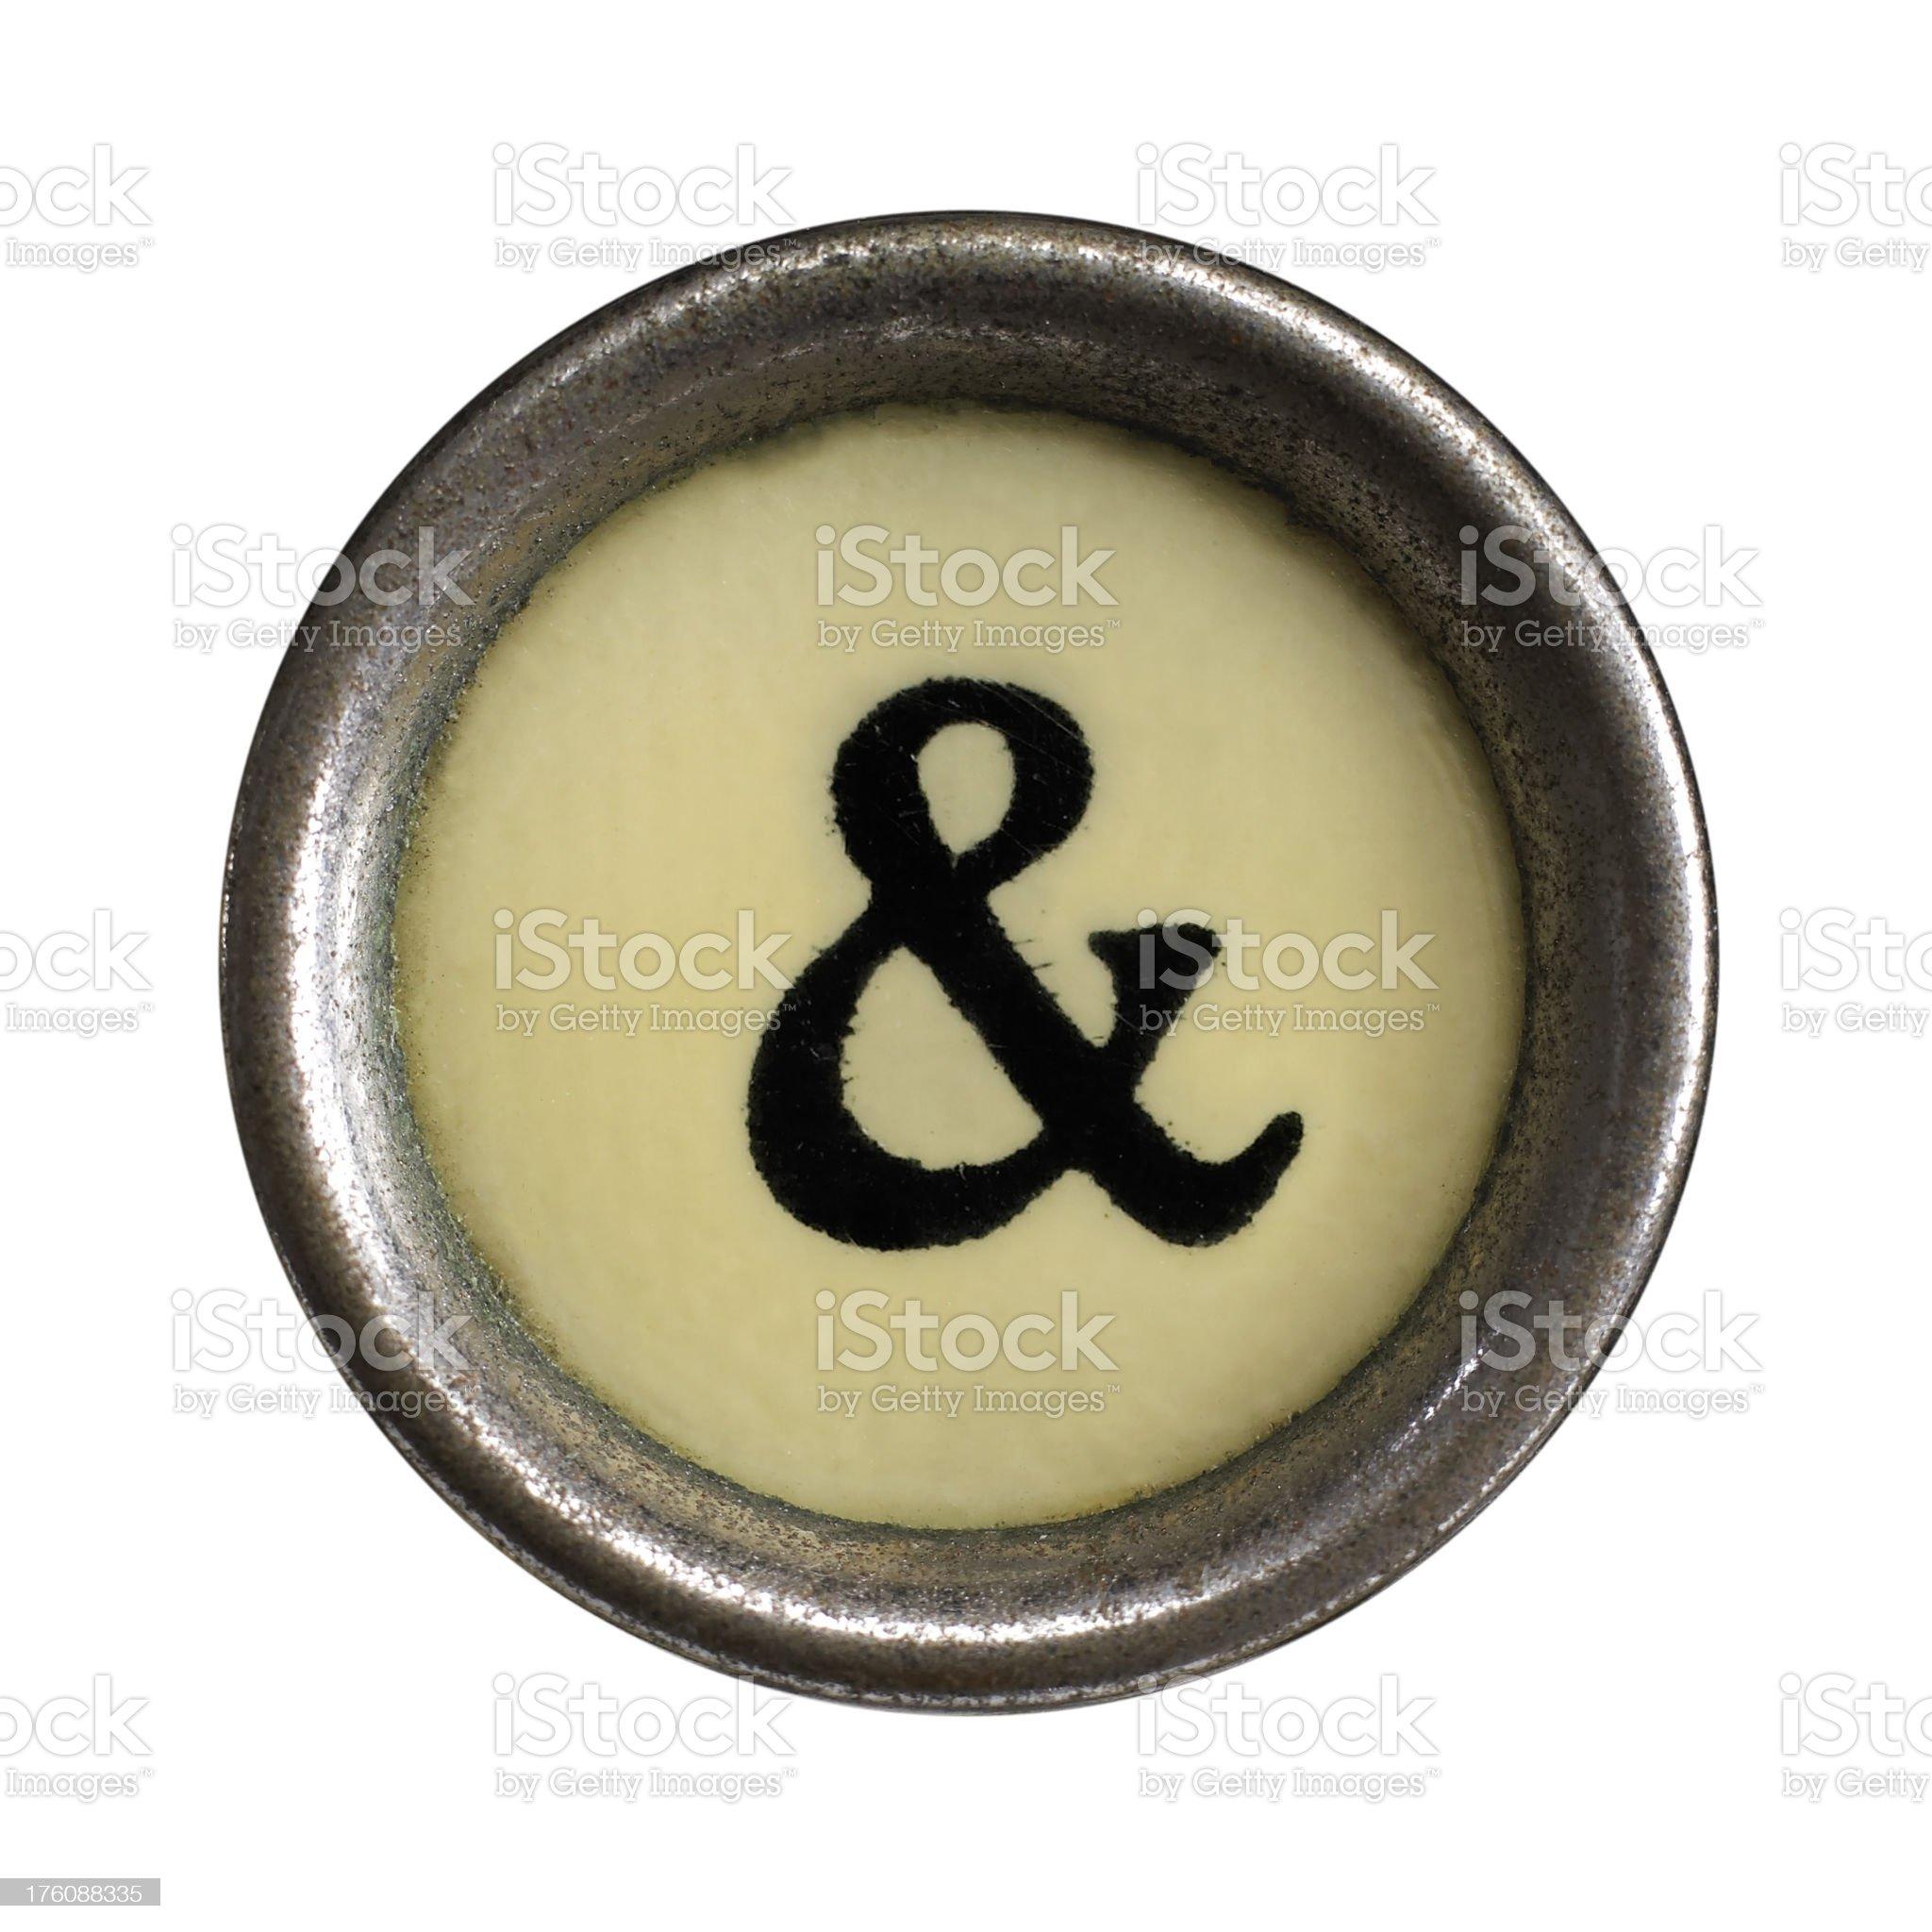 '&' symbol royalty-free stock photo